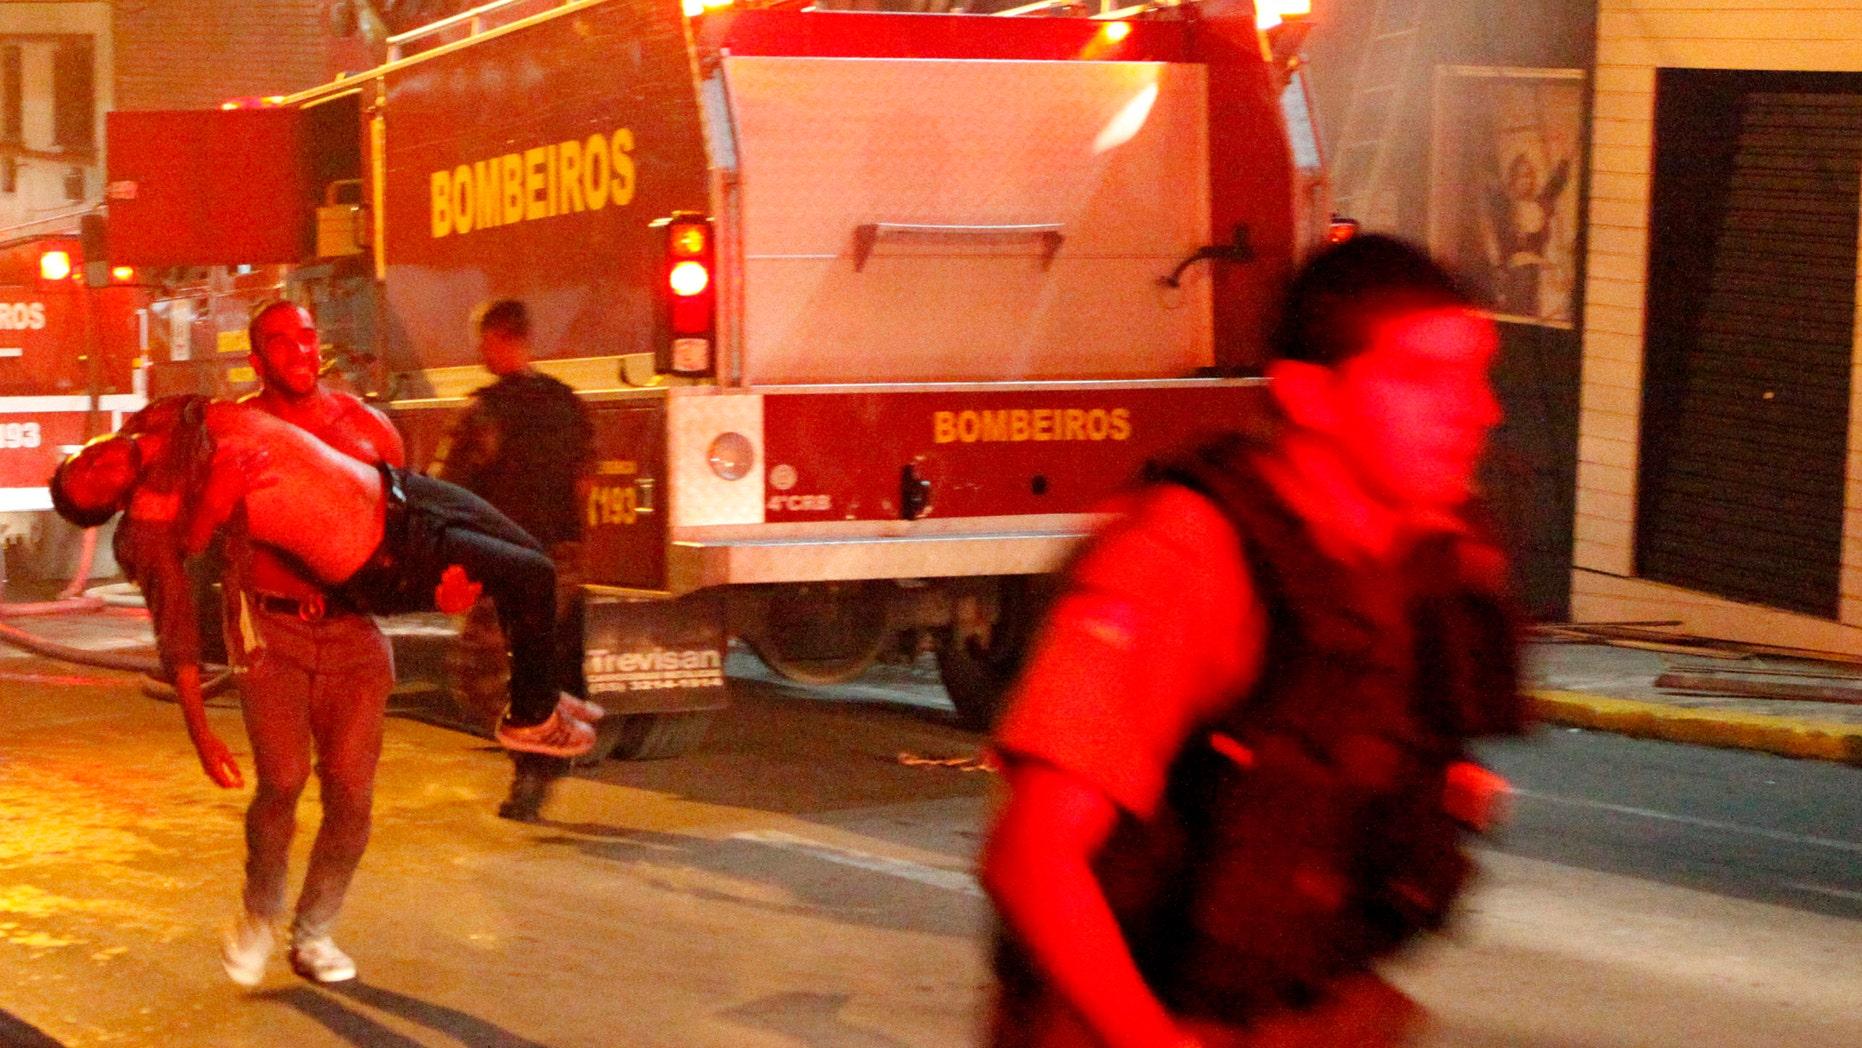 A man carries an injured man, victim of a fire at the Kiss  club in Santa Maria city,  Rio Grande do Sul state, Brazil, early Sunday, Jan. 27, 2013.  (AP Photo/Agencia RBS)